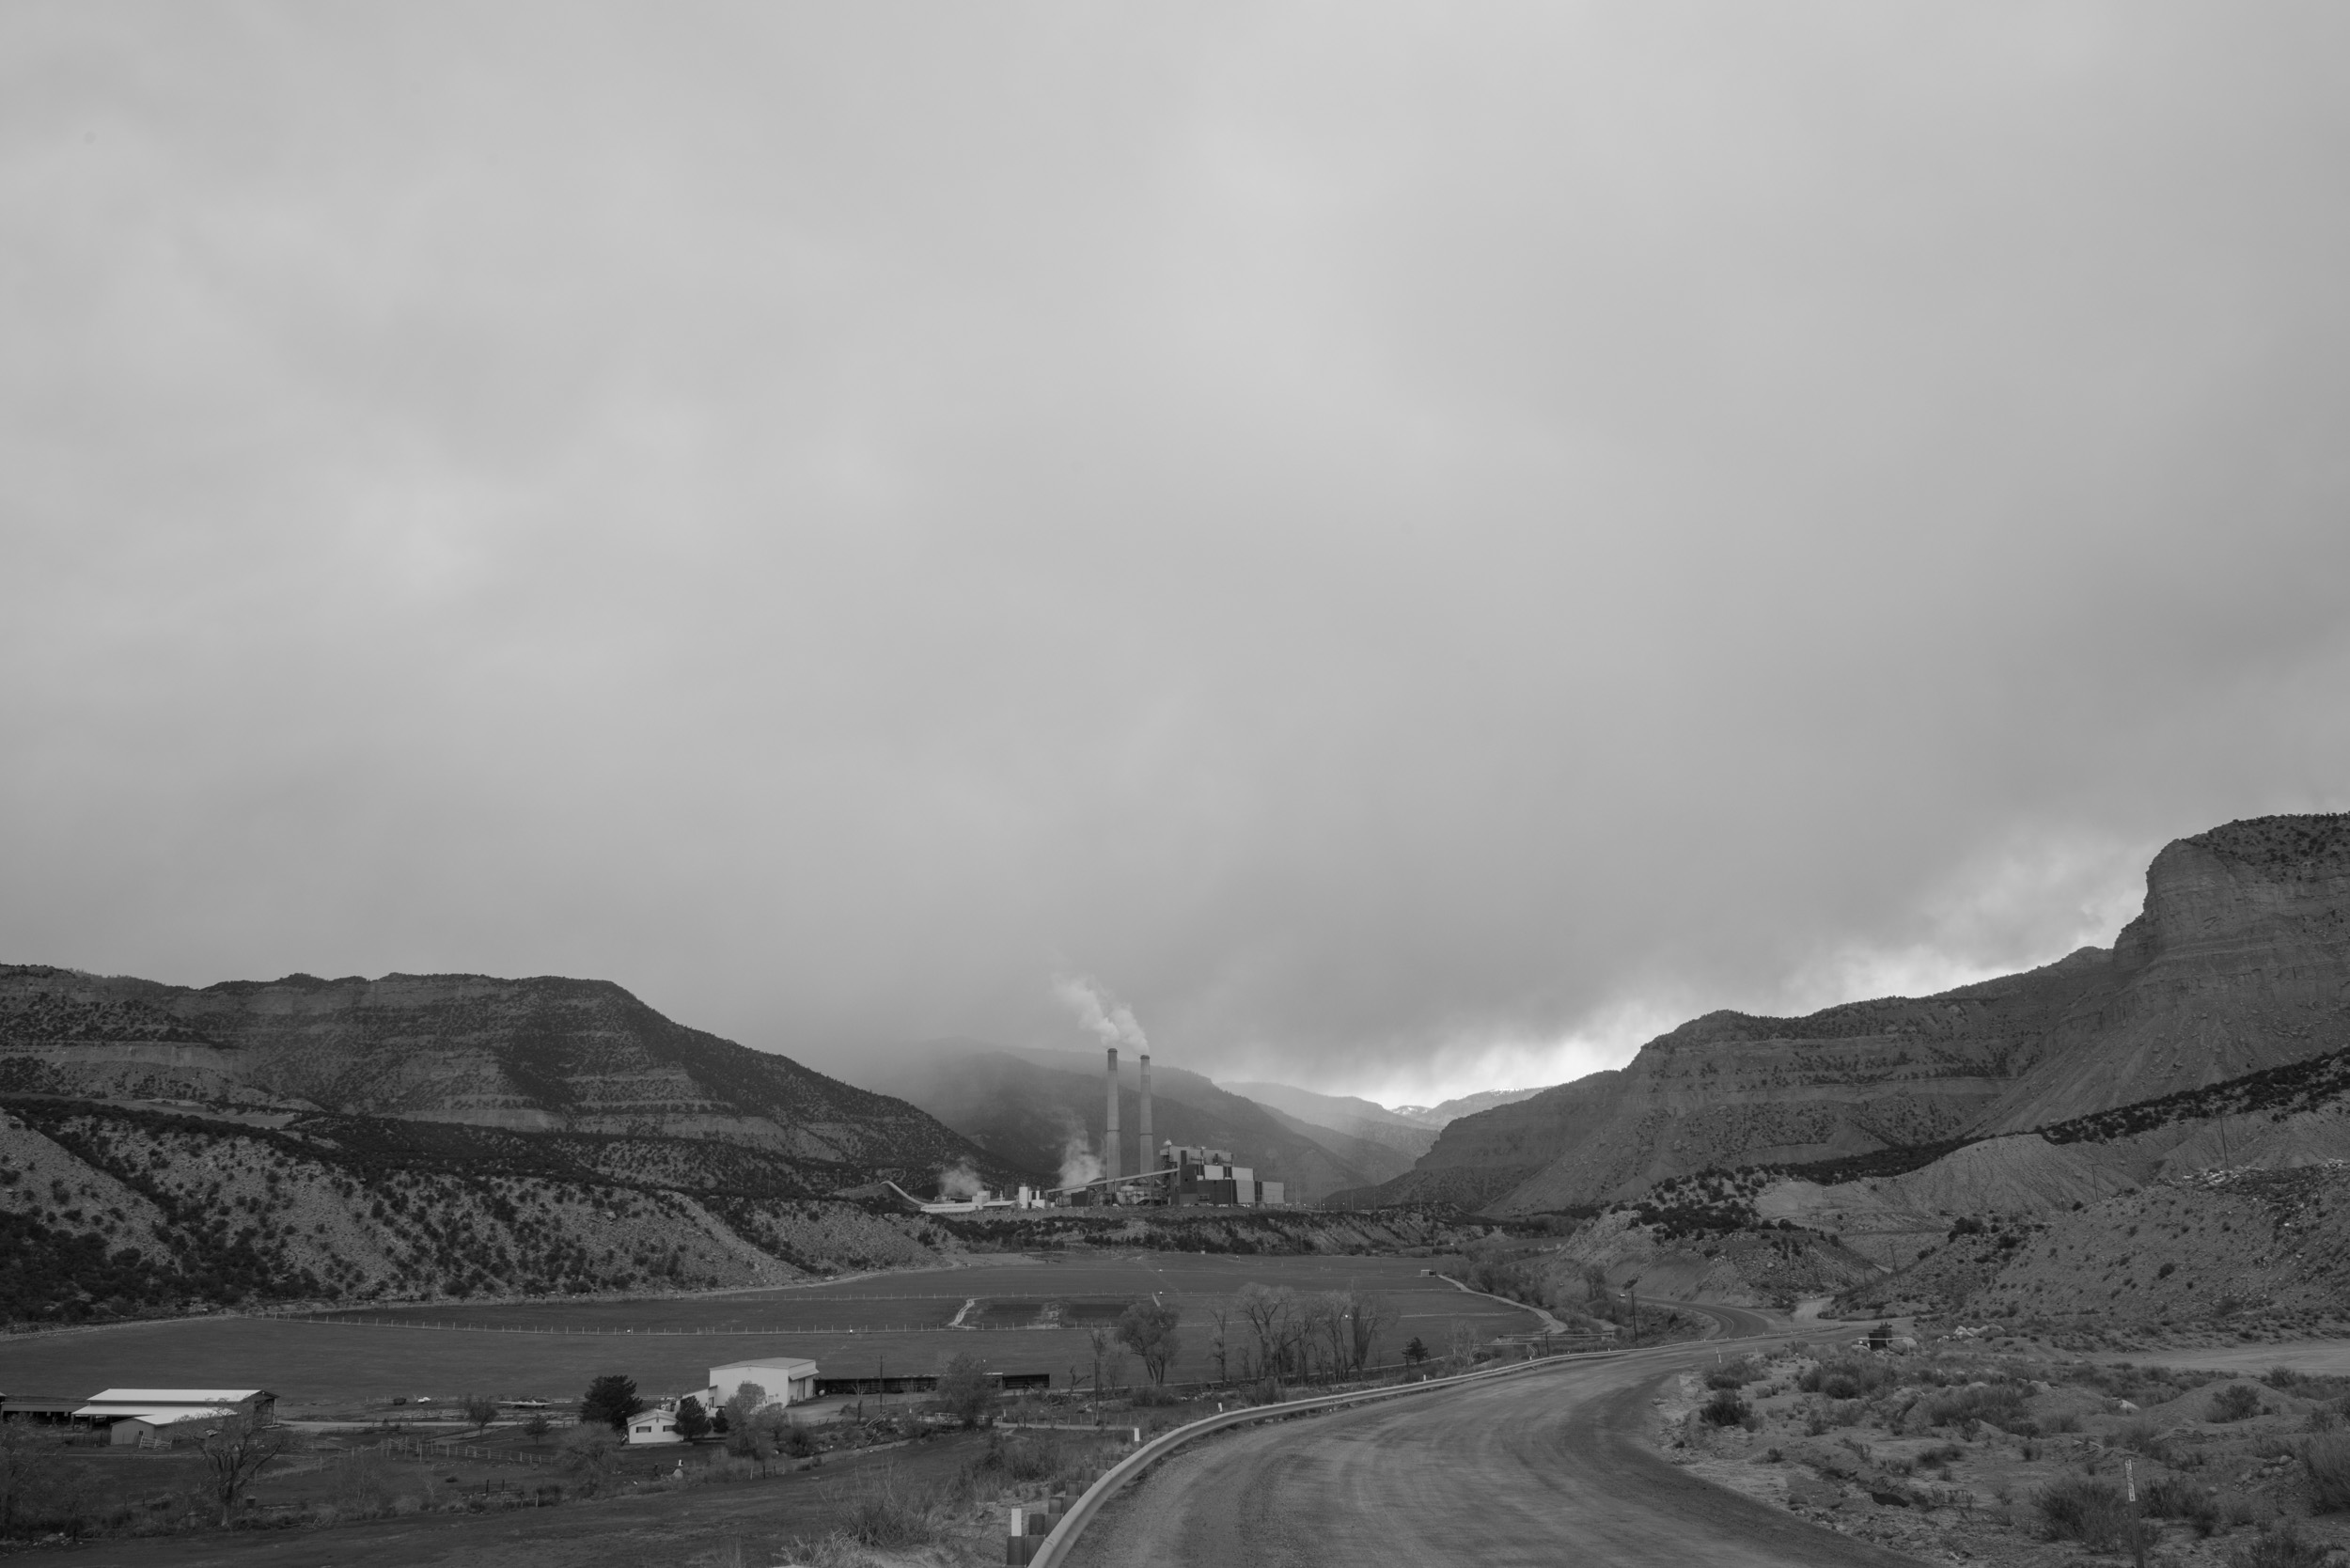 Huntington coal-fired power plant,Wasatch Plateau,Utah.